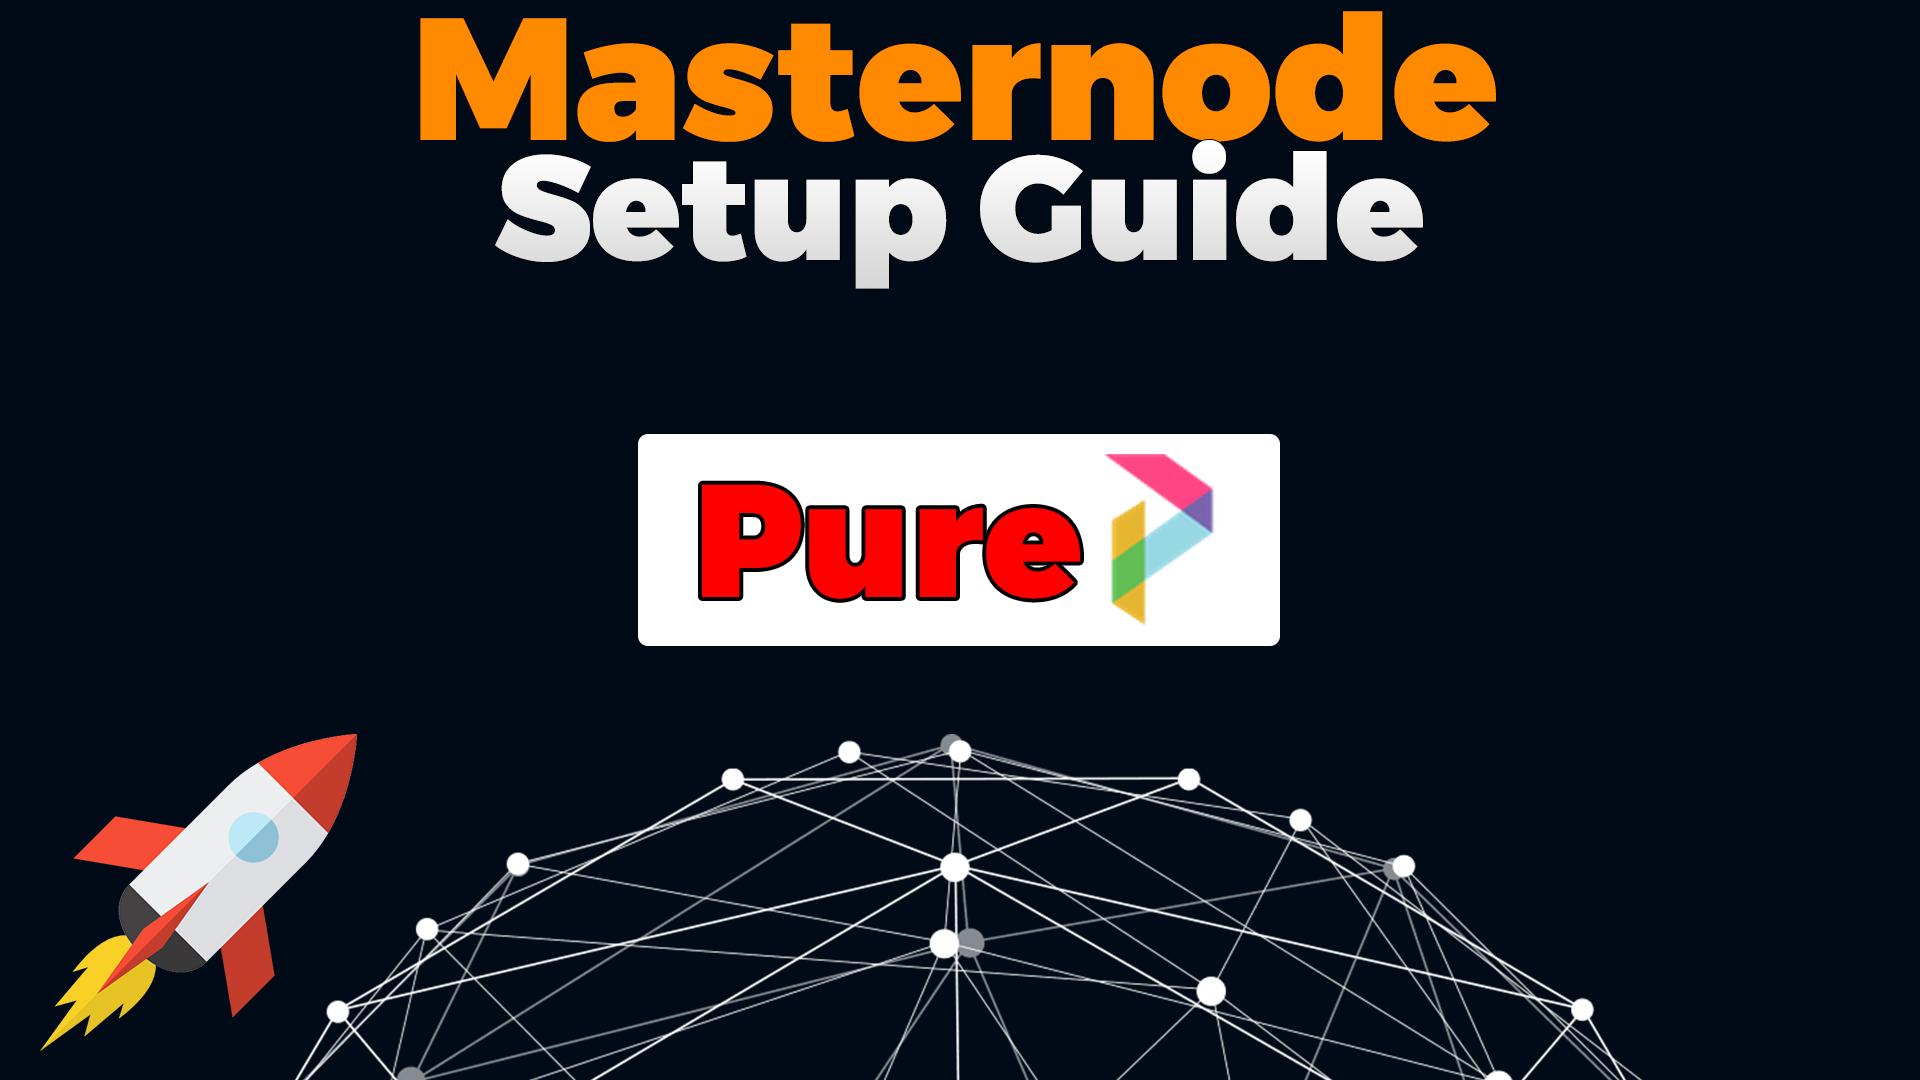 pure masternode setup